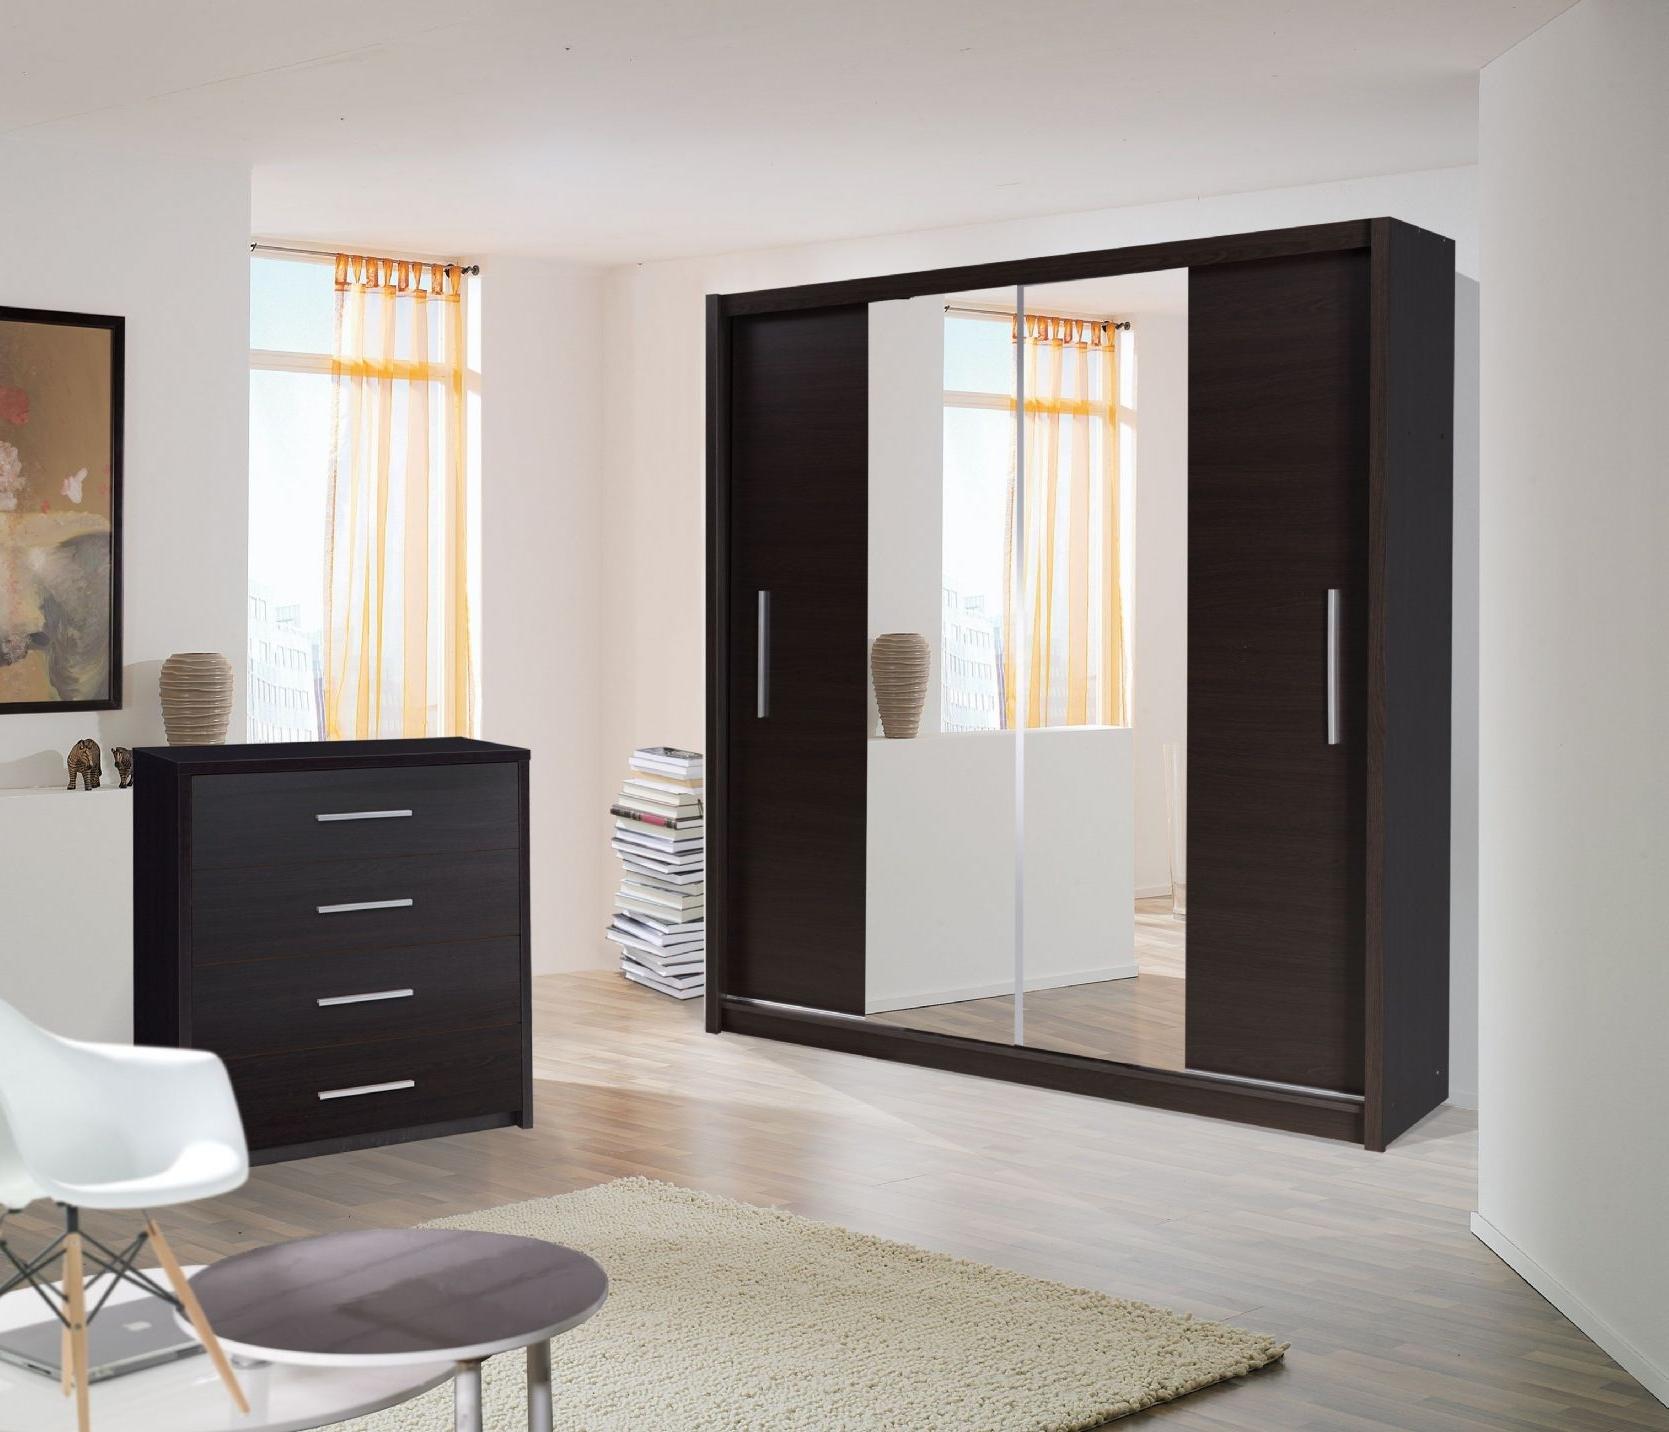 2017 Black Gloss Wardrobes Throughout Mirror Design Ideas: Black Gloss Wardrobes With Mirrored Sliding (View 15 of 15)